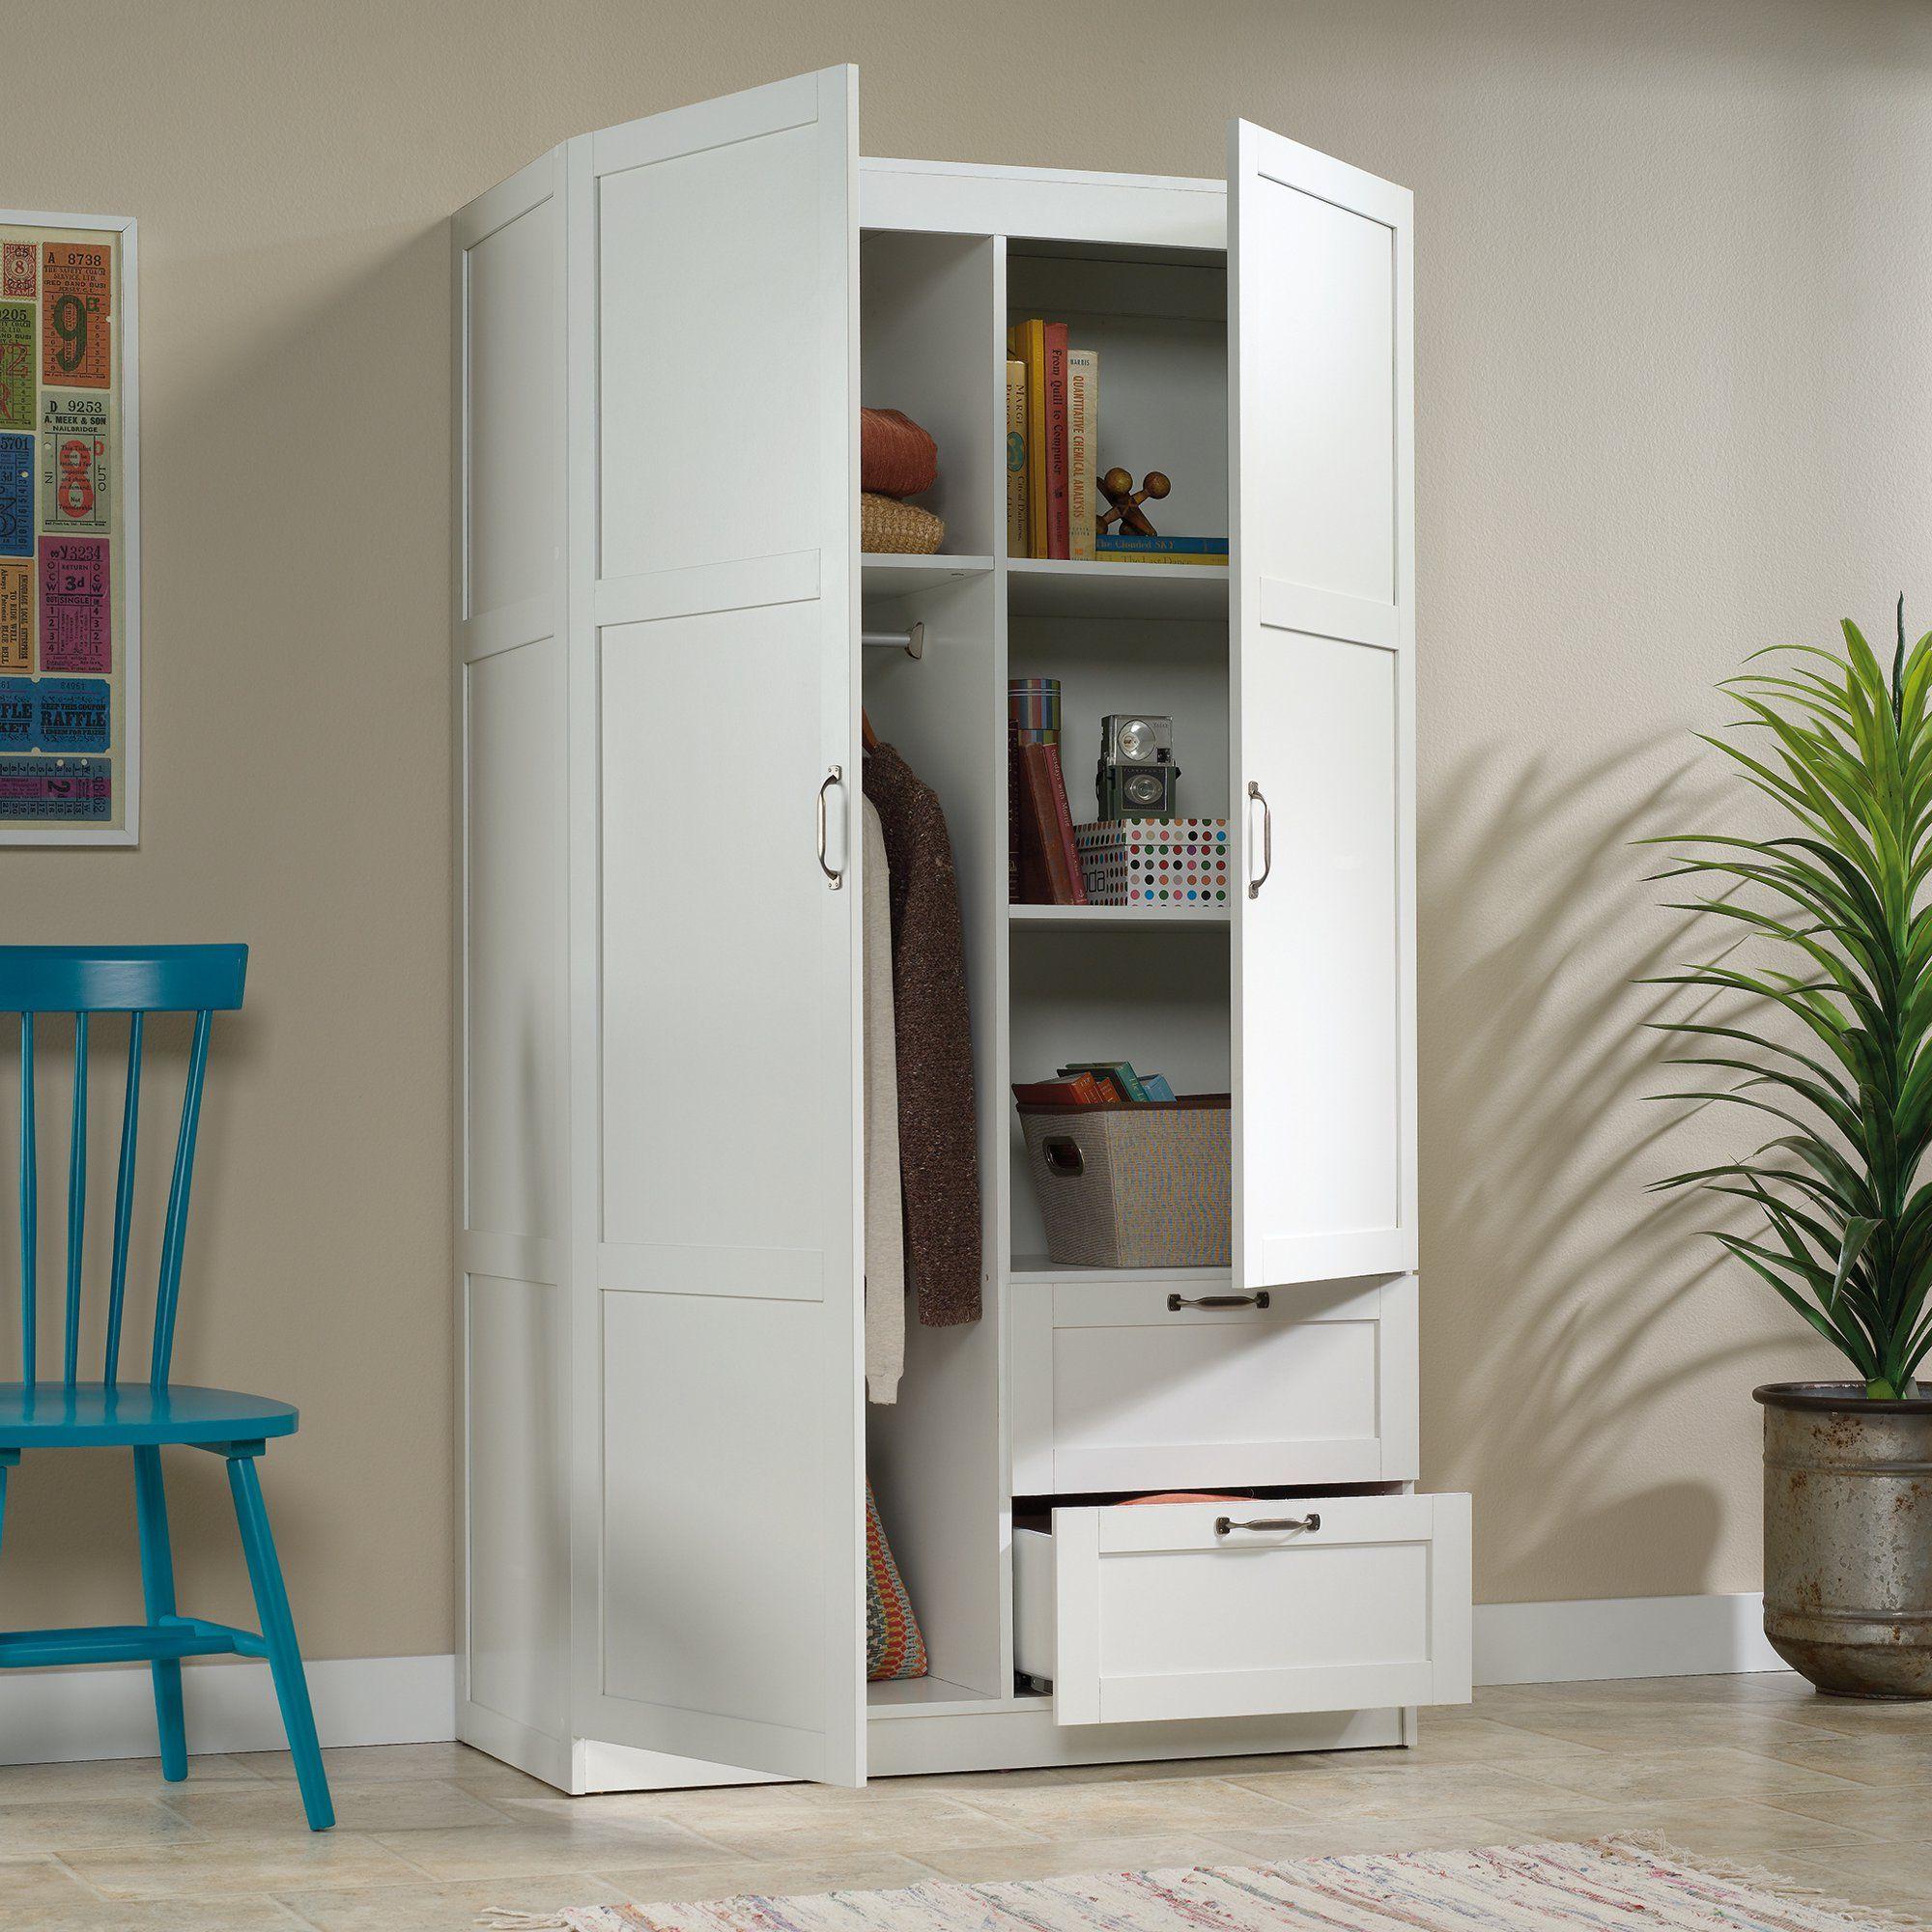 Sauder Select Wardrobe Armoire, White Finish - Walmart.com in 9